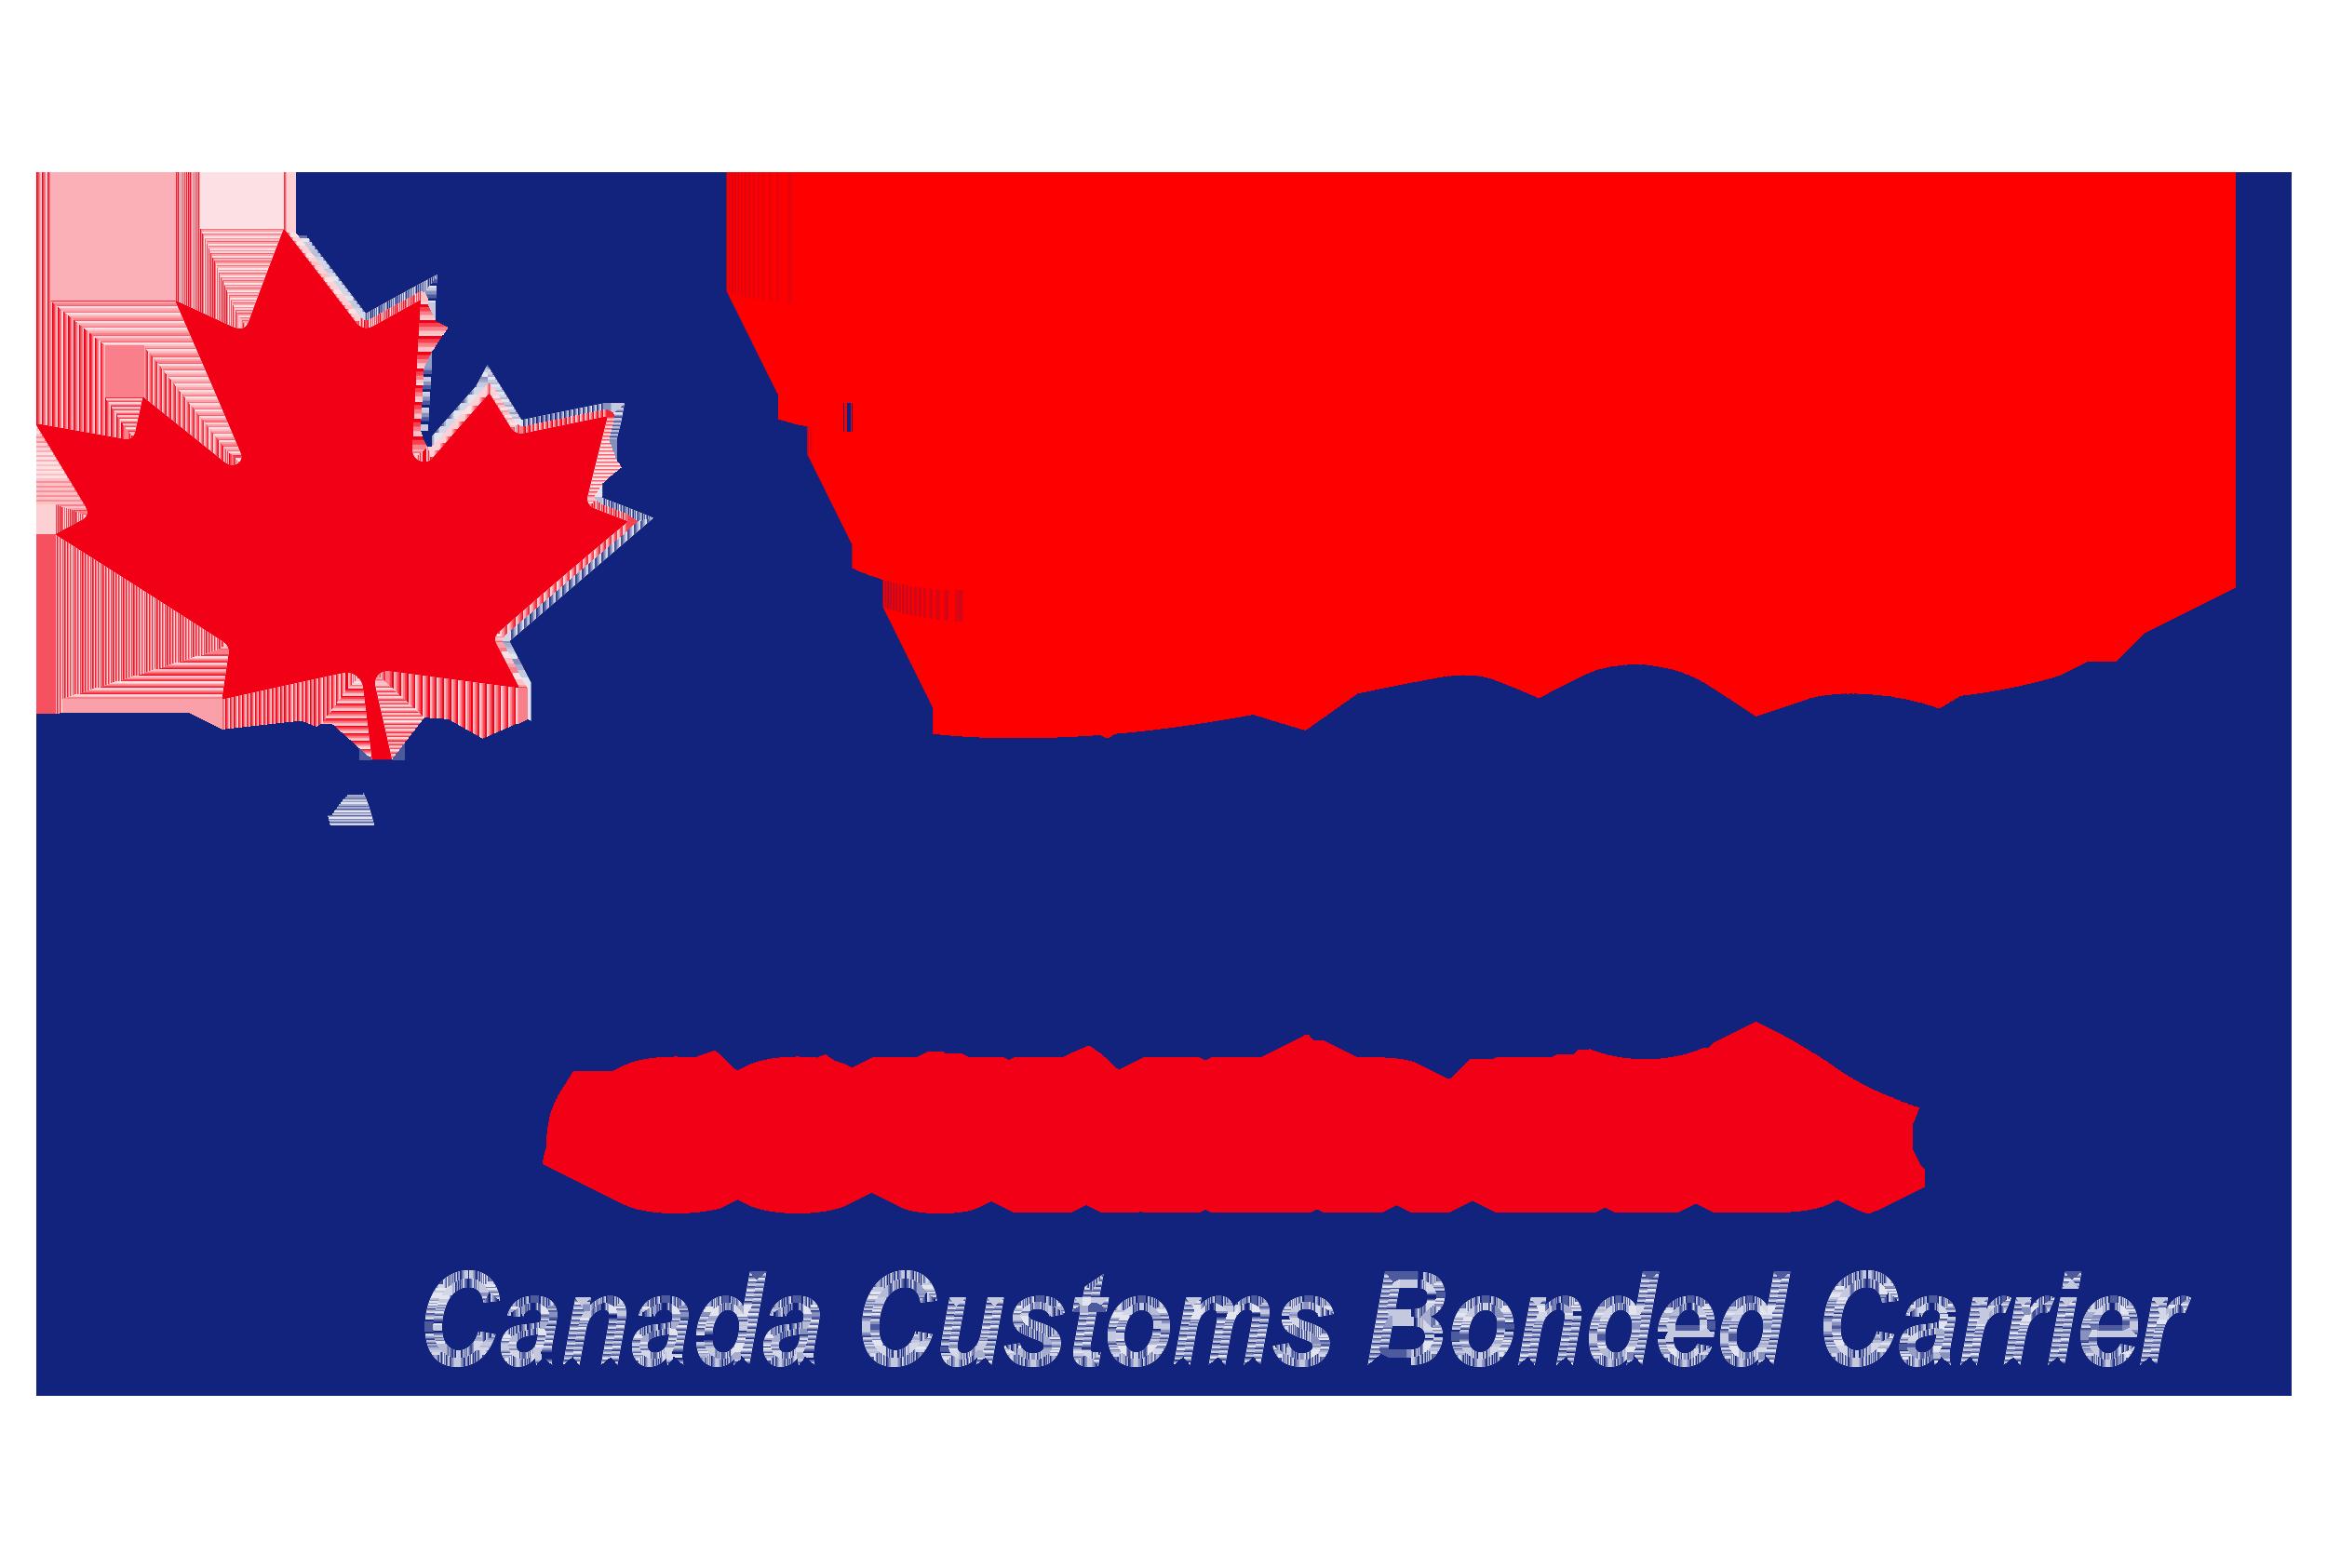 White Rock Courier Ltd